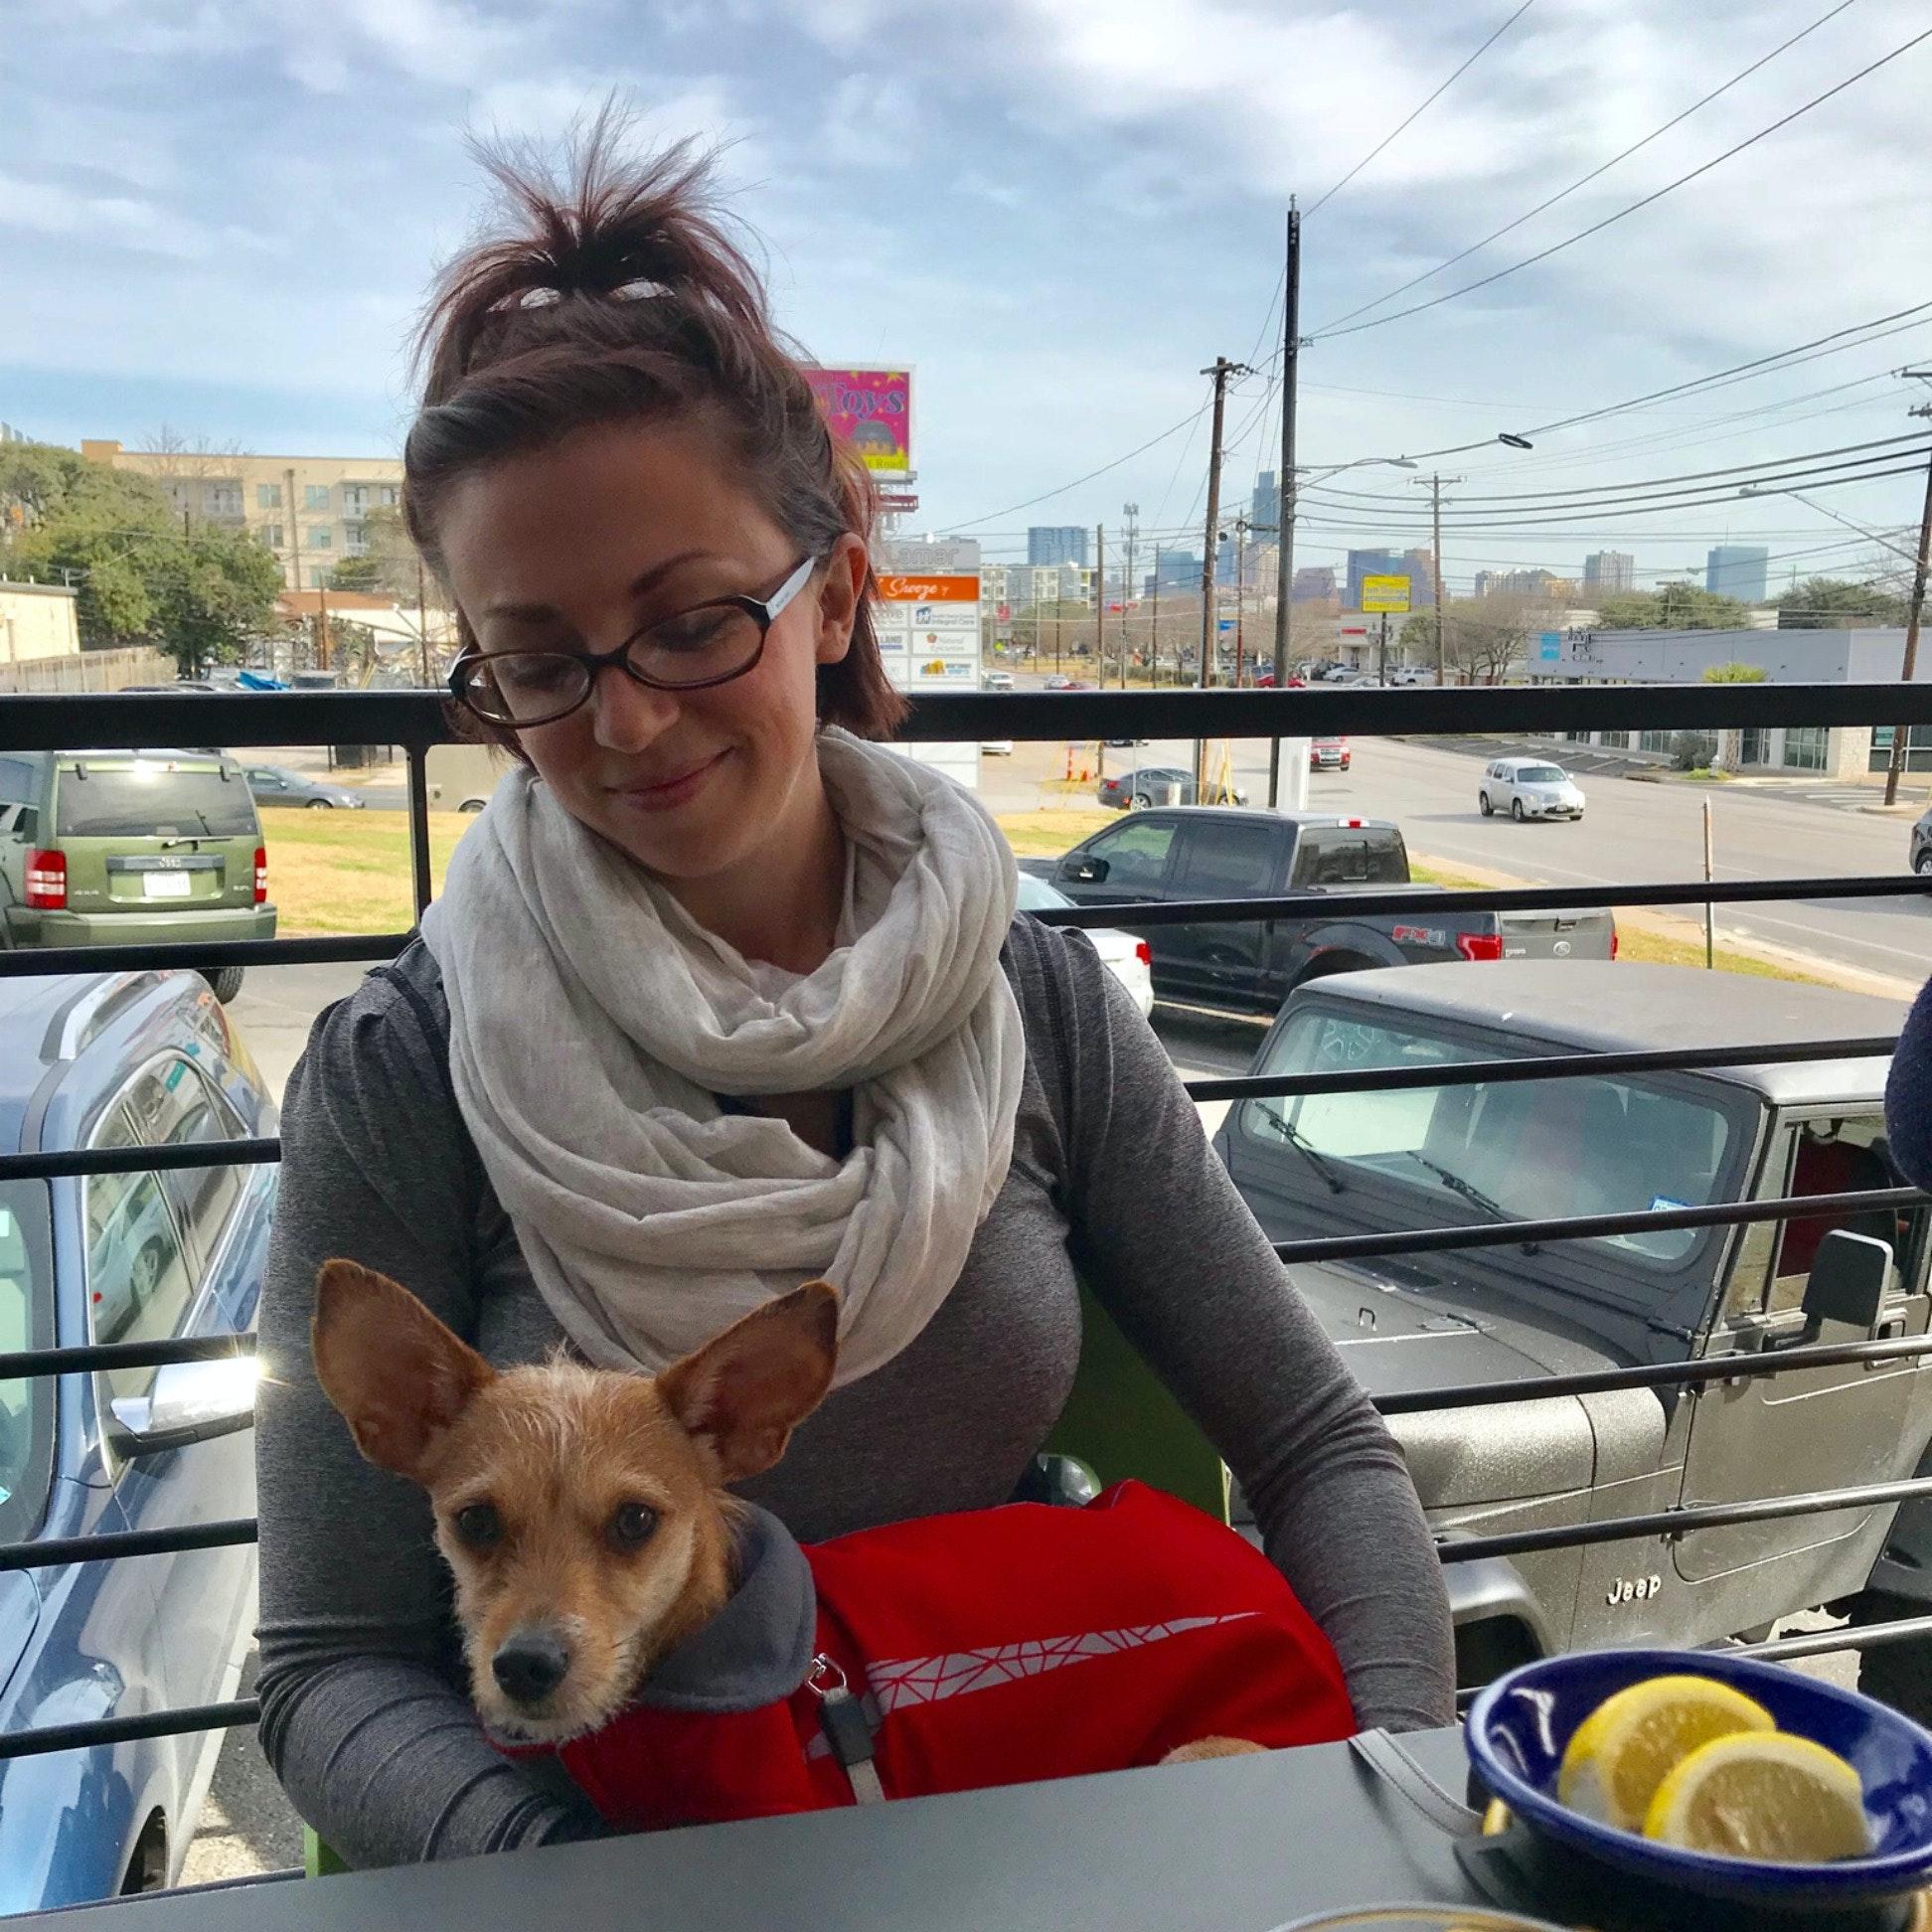 Justine's dog boarding